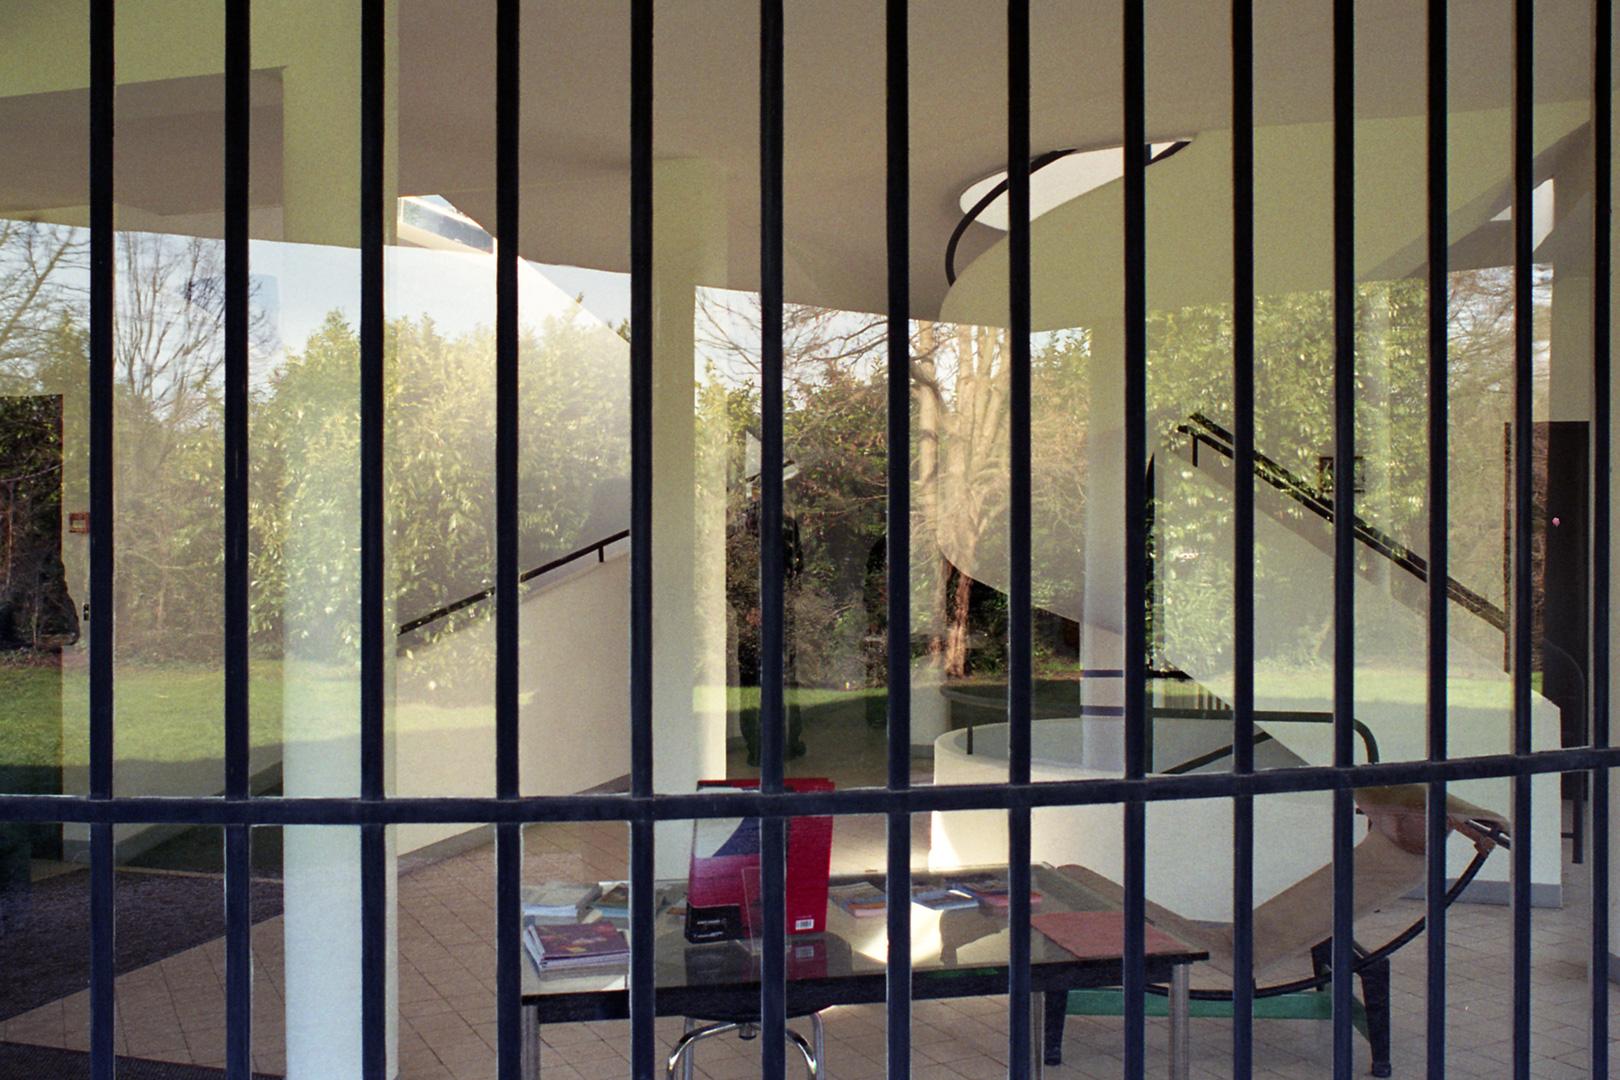 le-corbusier_44_Le_Corbusier_Villa_Savoie_LC3_Villa-Savoie-2003-08-copia